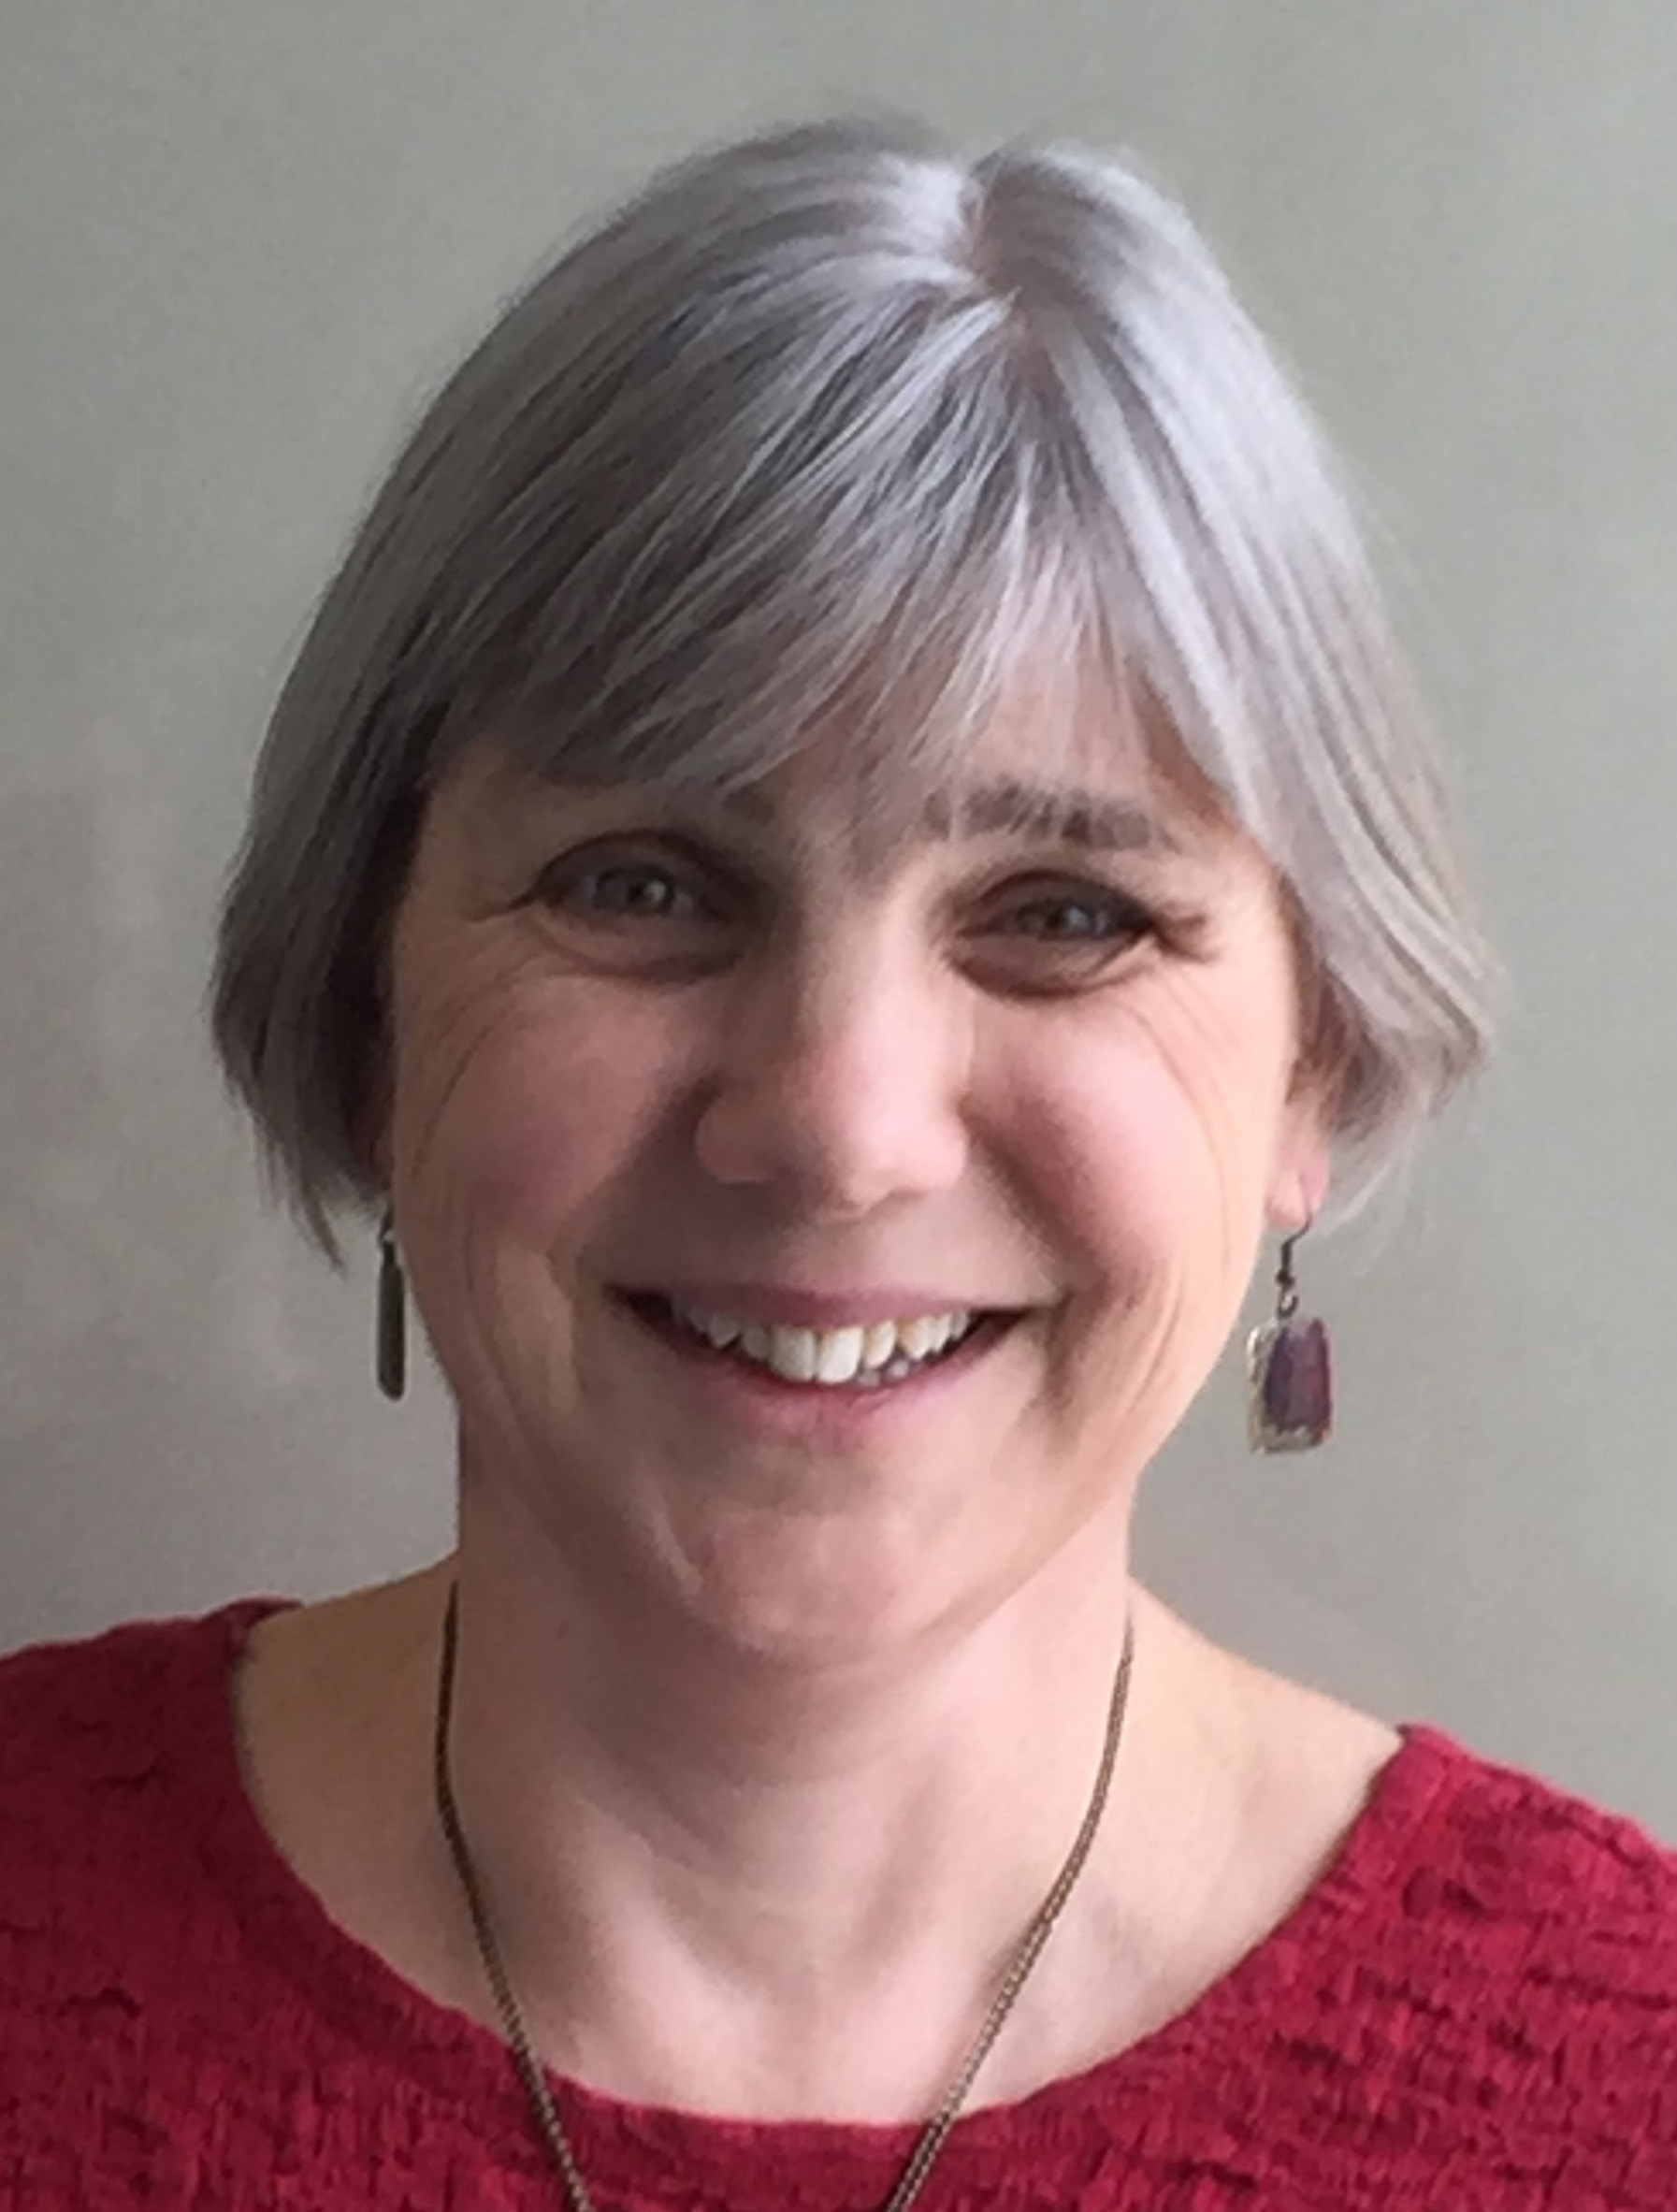 Profile picture of Margaret Kertesz